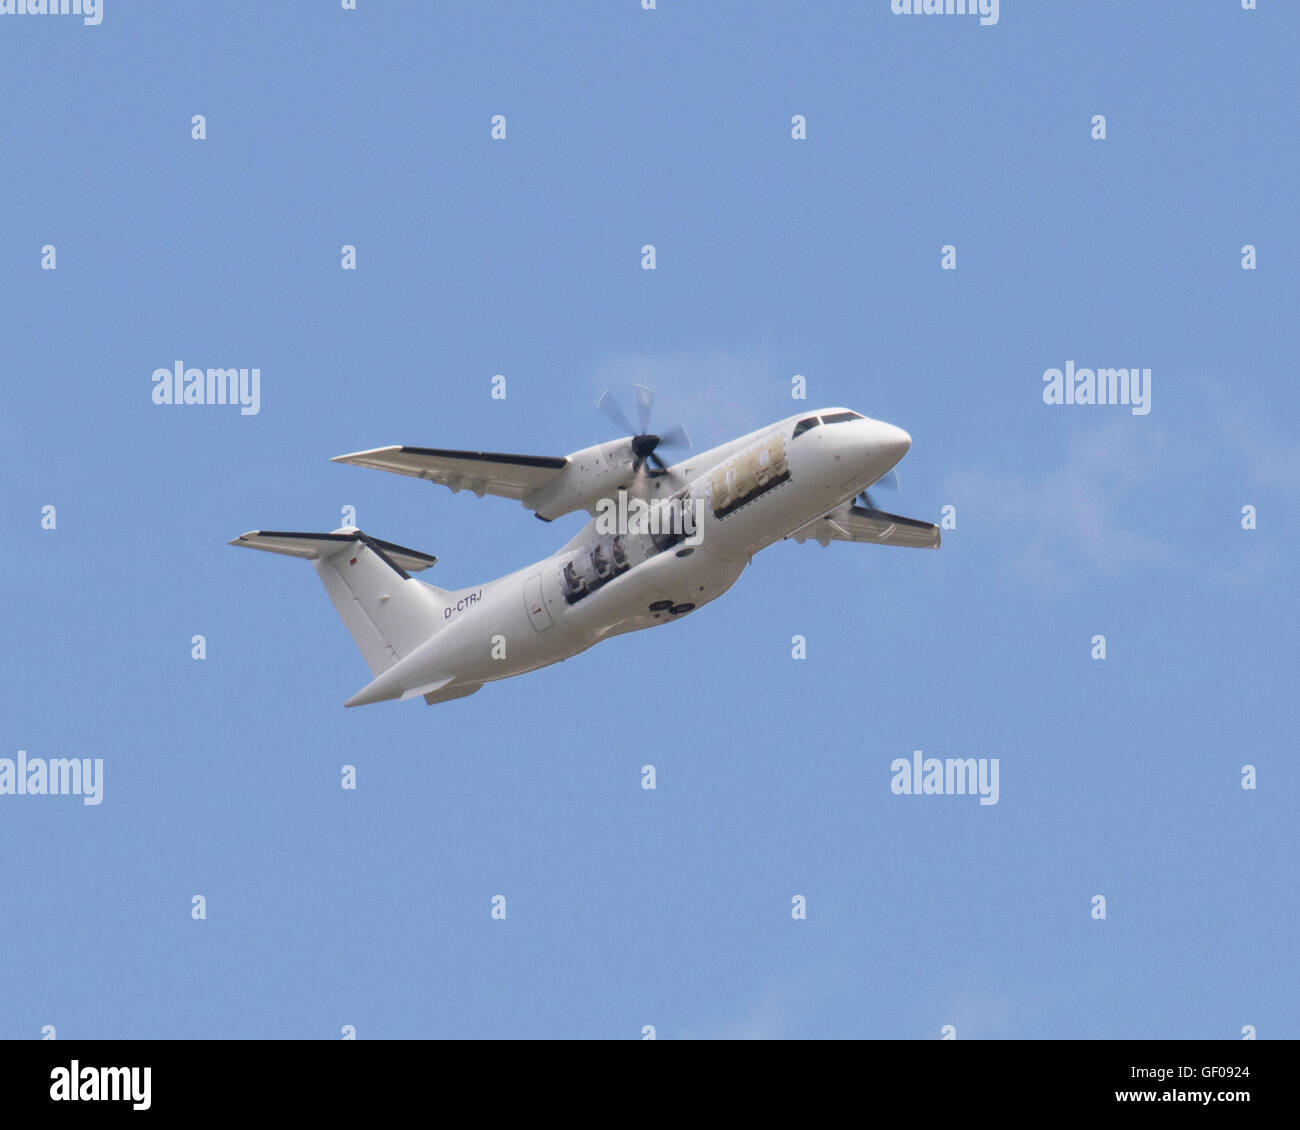 Dornier 328 twin turbo-prop aircraft registration D-CTRJ flying at